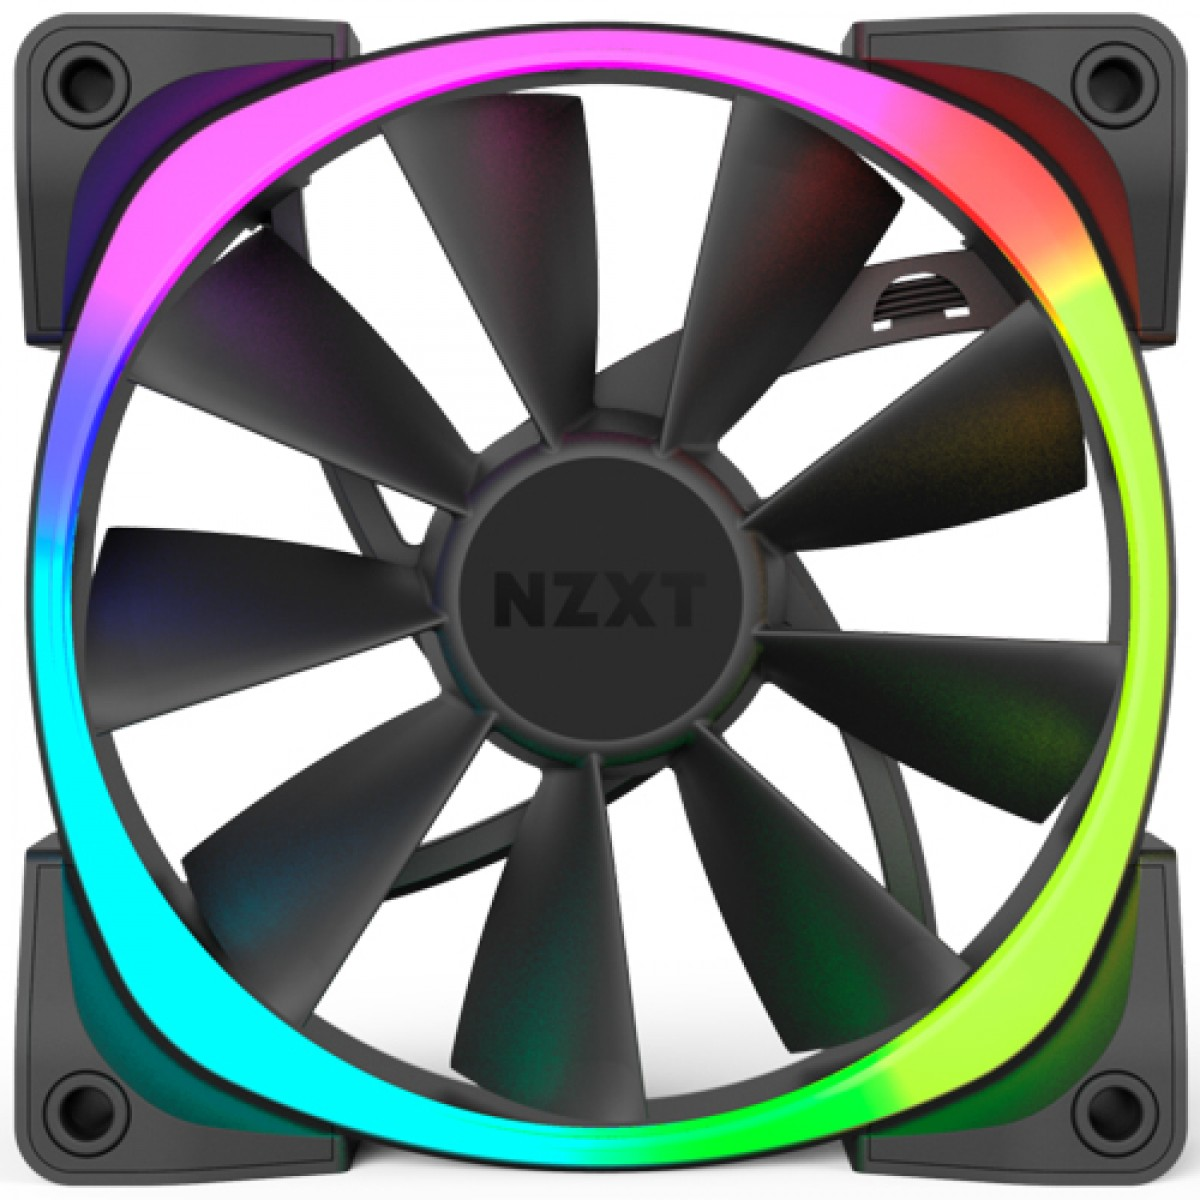 Kit Fan com 3 Unidades NZXT Aer, RGB 120mm, RF-AR120-T1